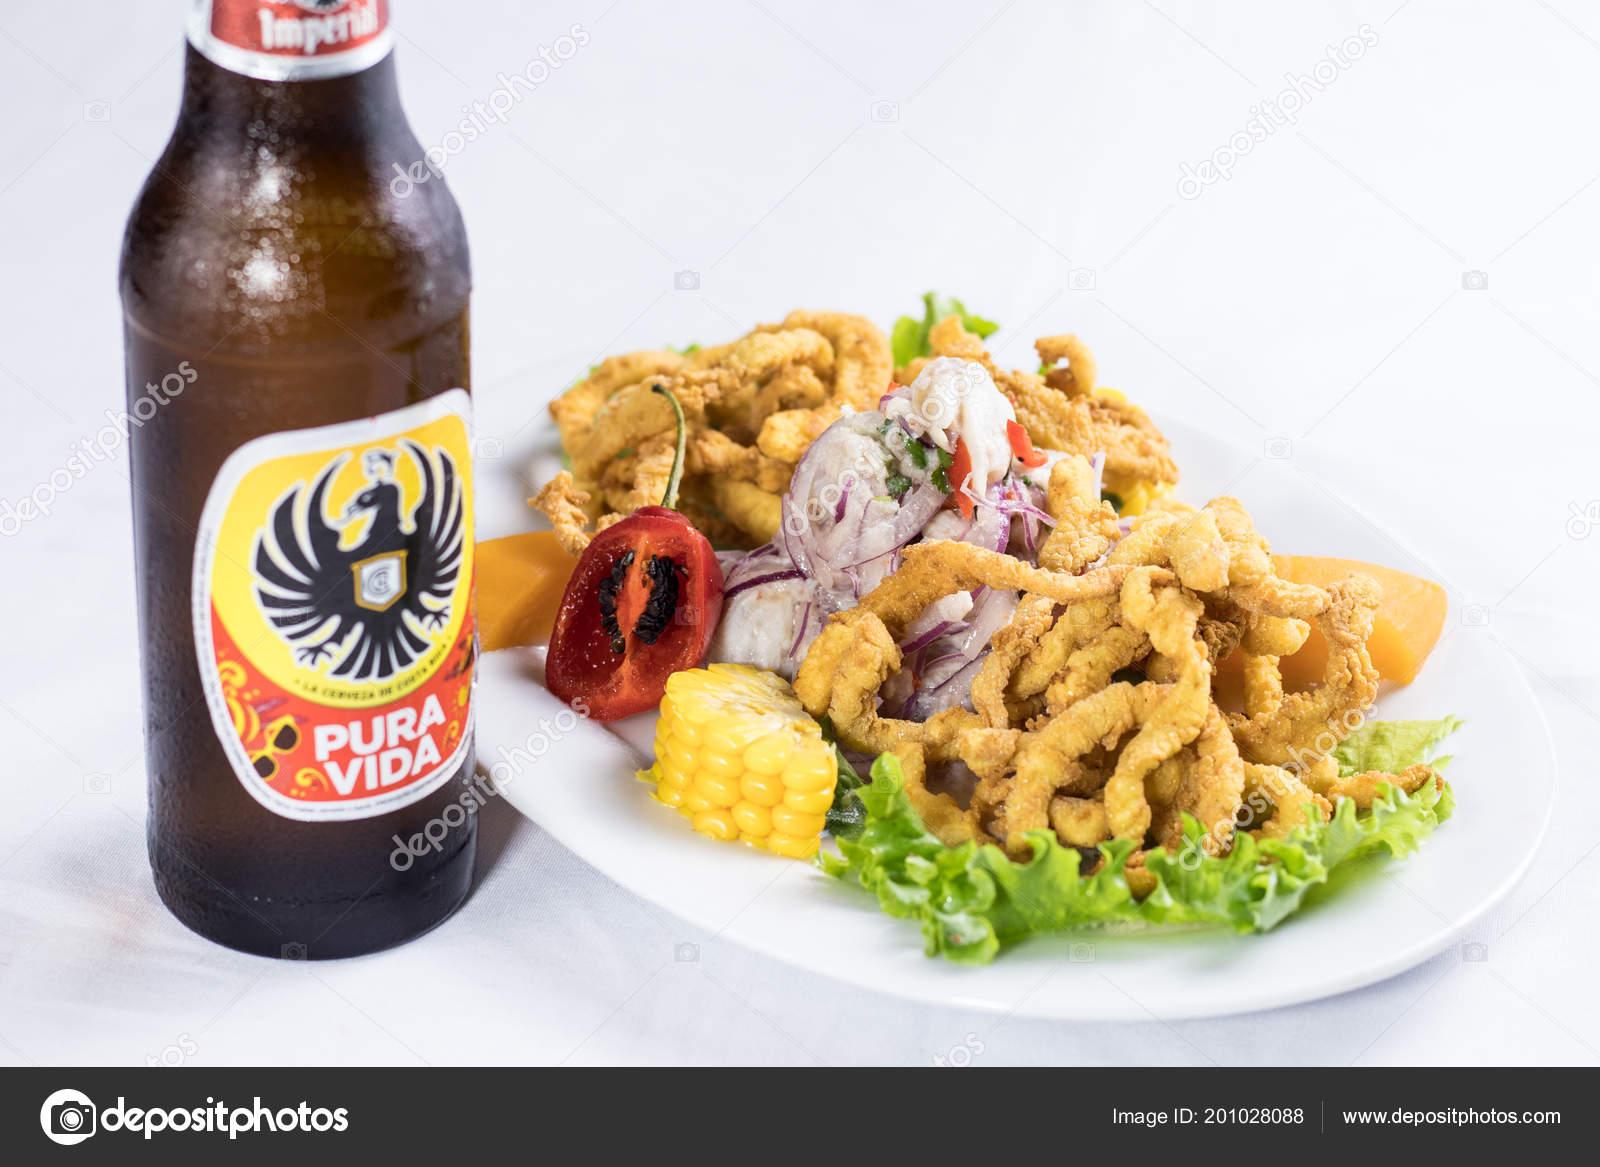 Peruvian Food Ceviche Pescado Con Calamar Con Cerveza Stock Photo Image By Denismantilla 201028088